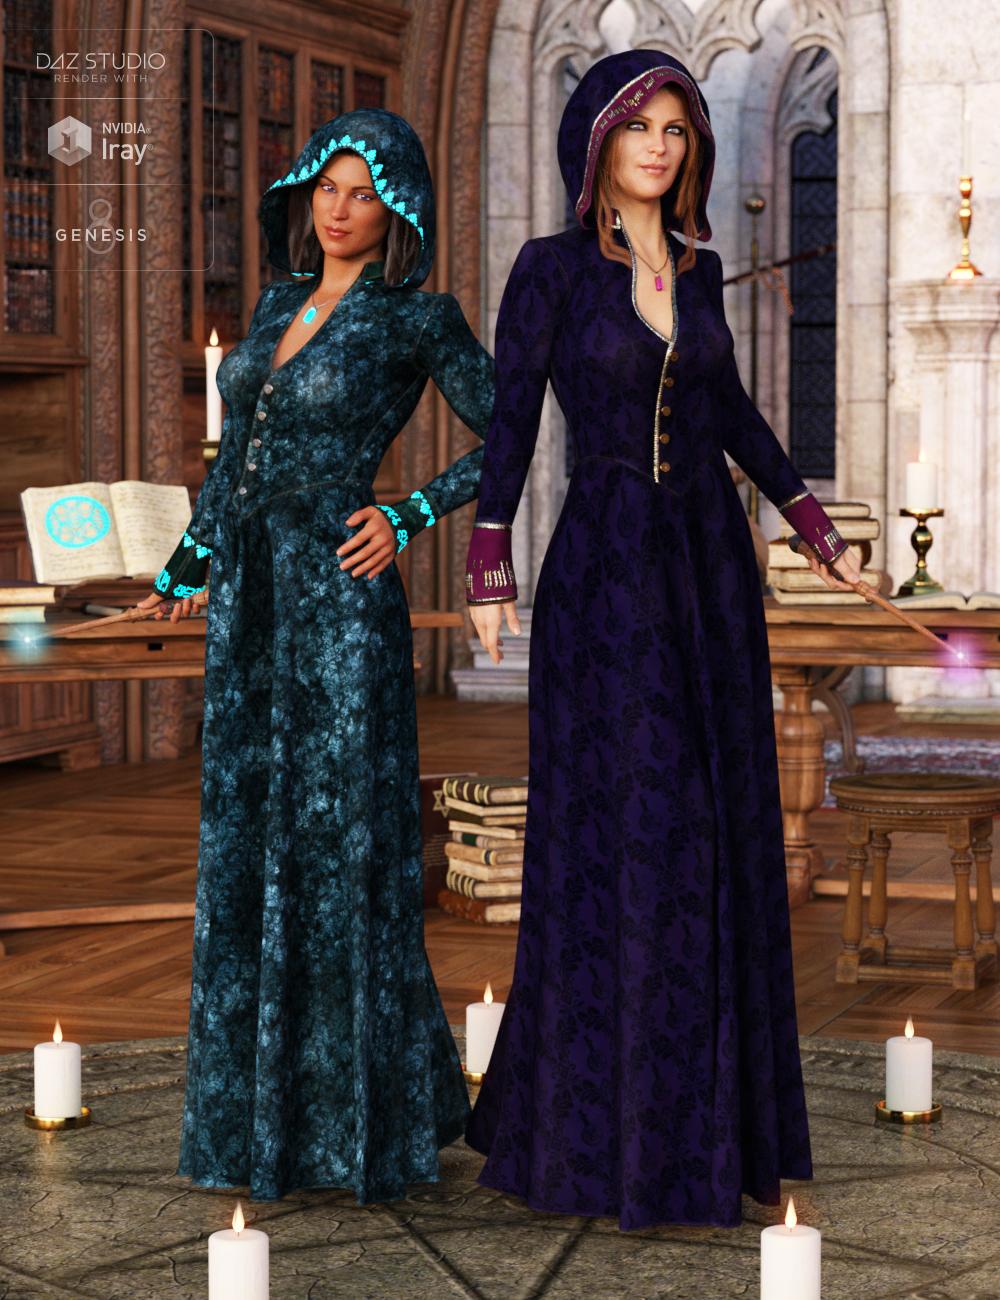 Sorceress Apprentice Outfit Textures by: Arien, 3D Models by Daz 3D